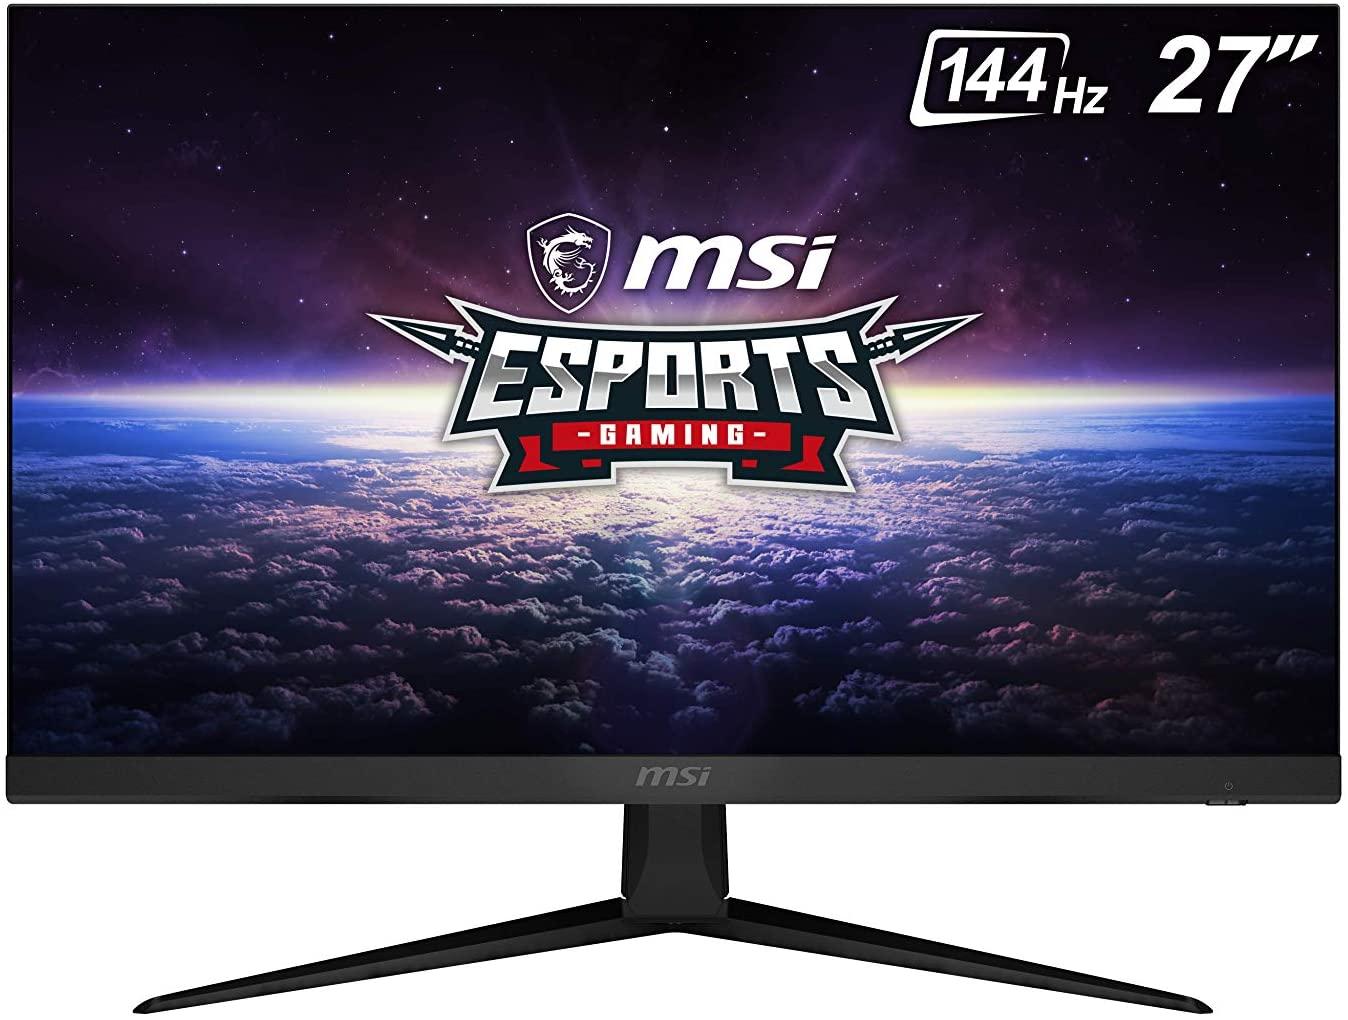 MSI Optix G271 Gaming-monitor, 27 inch, FullHD 144 Hz (IPS-paneel, verhouding 16:9, AMD FreeSync, 1 ms reactie)